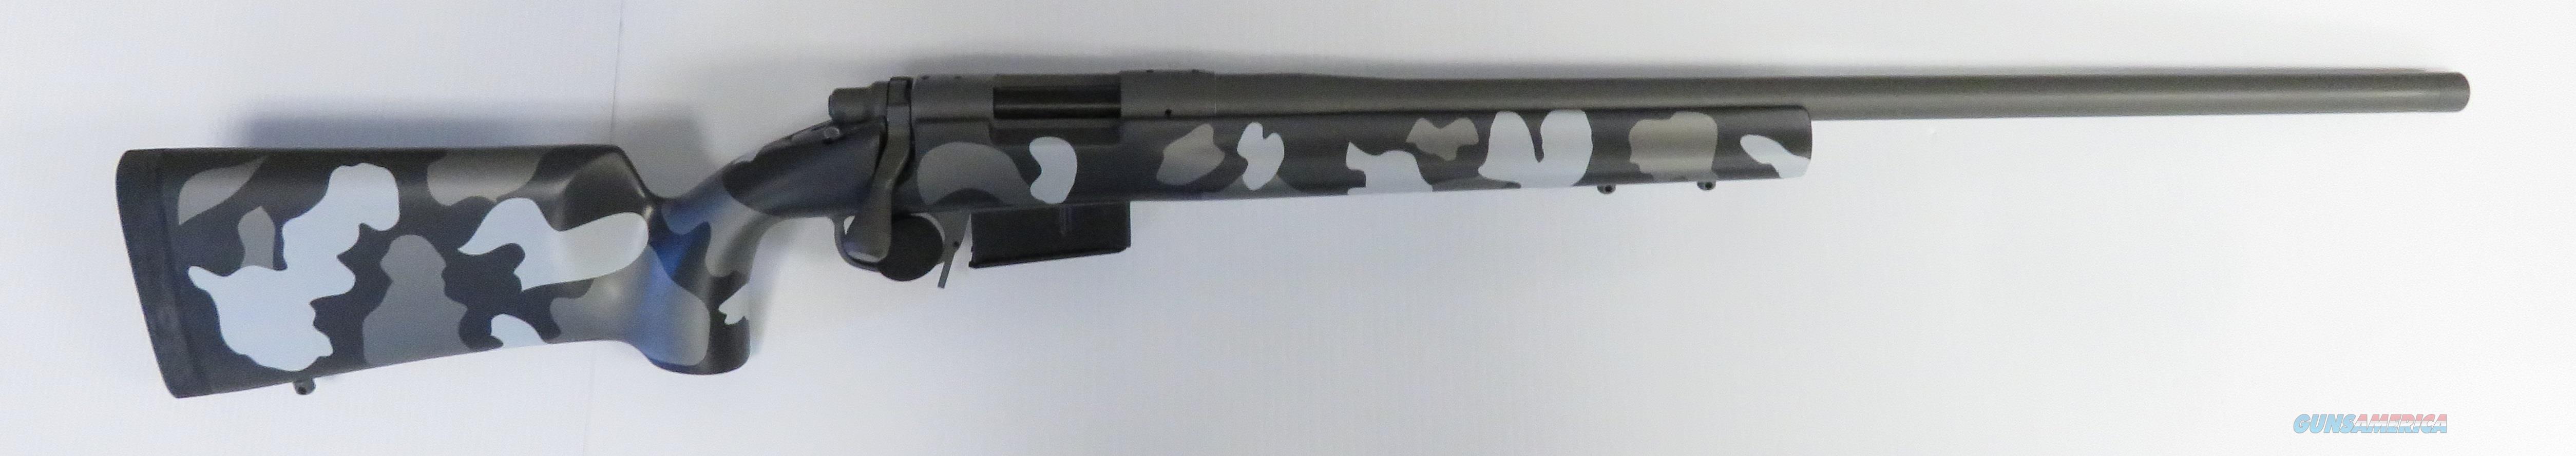 "Remington Model 700 Creedmore (Dakota Custom Rifles) Bolt Action 6.5mm/.308 Multi-Caliber Rifle 26"" Barrel  Guns > Rifles > Remington Rifles - Modern > Model 700 > Sporting"